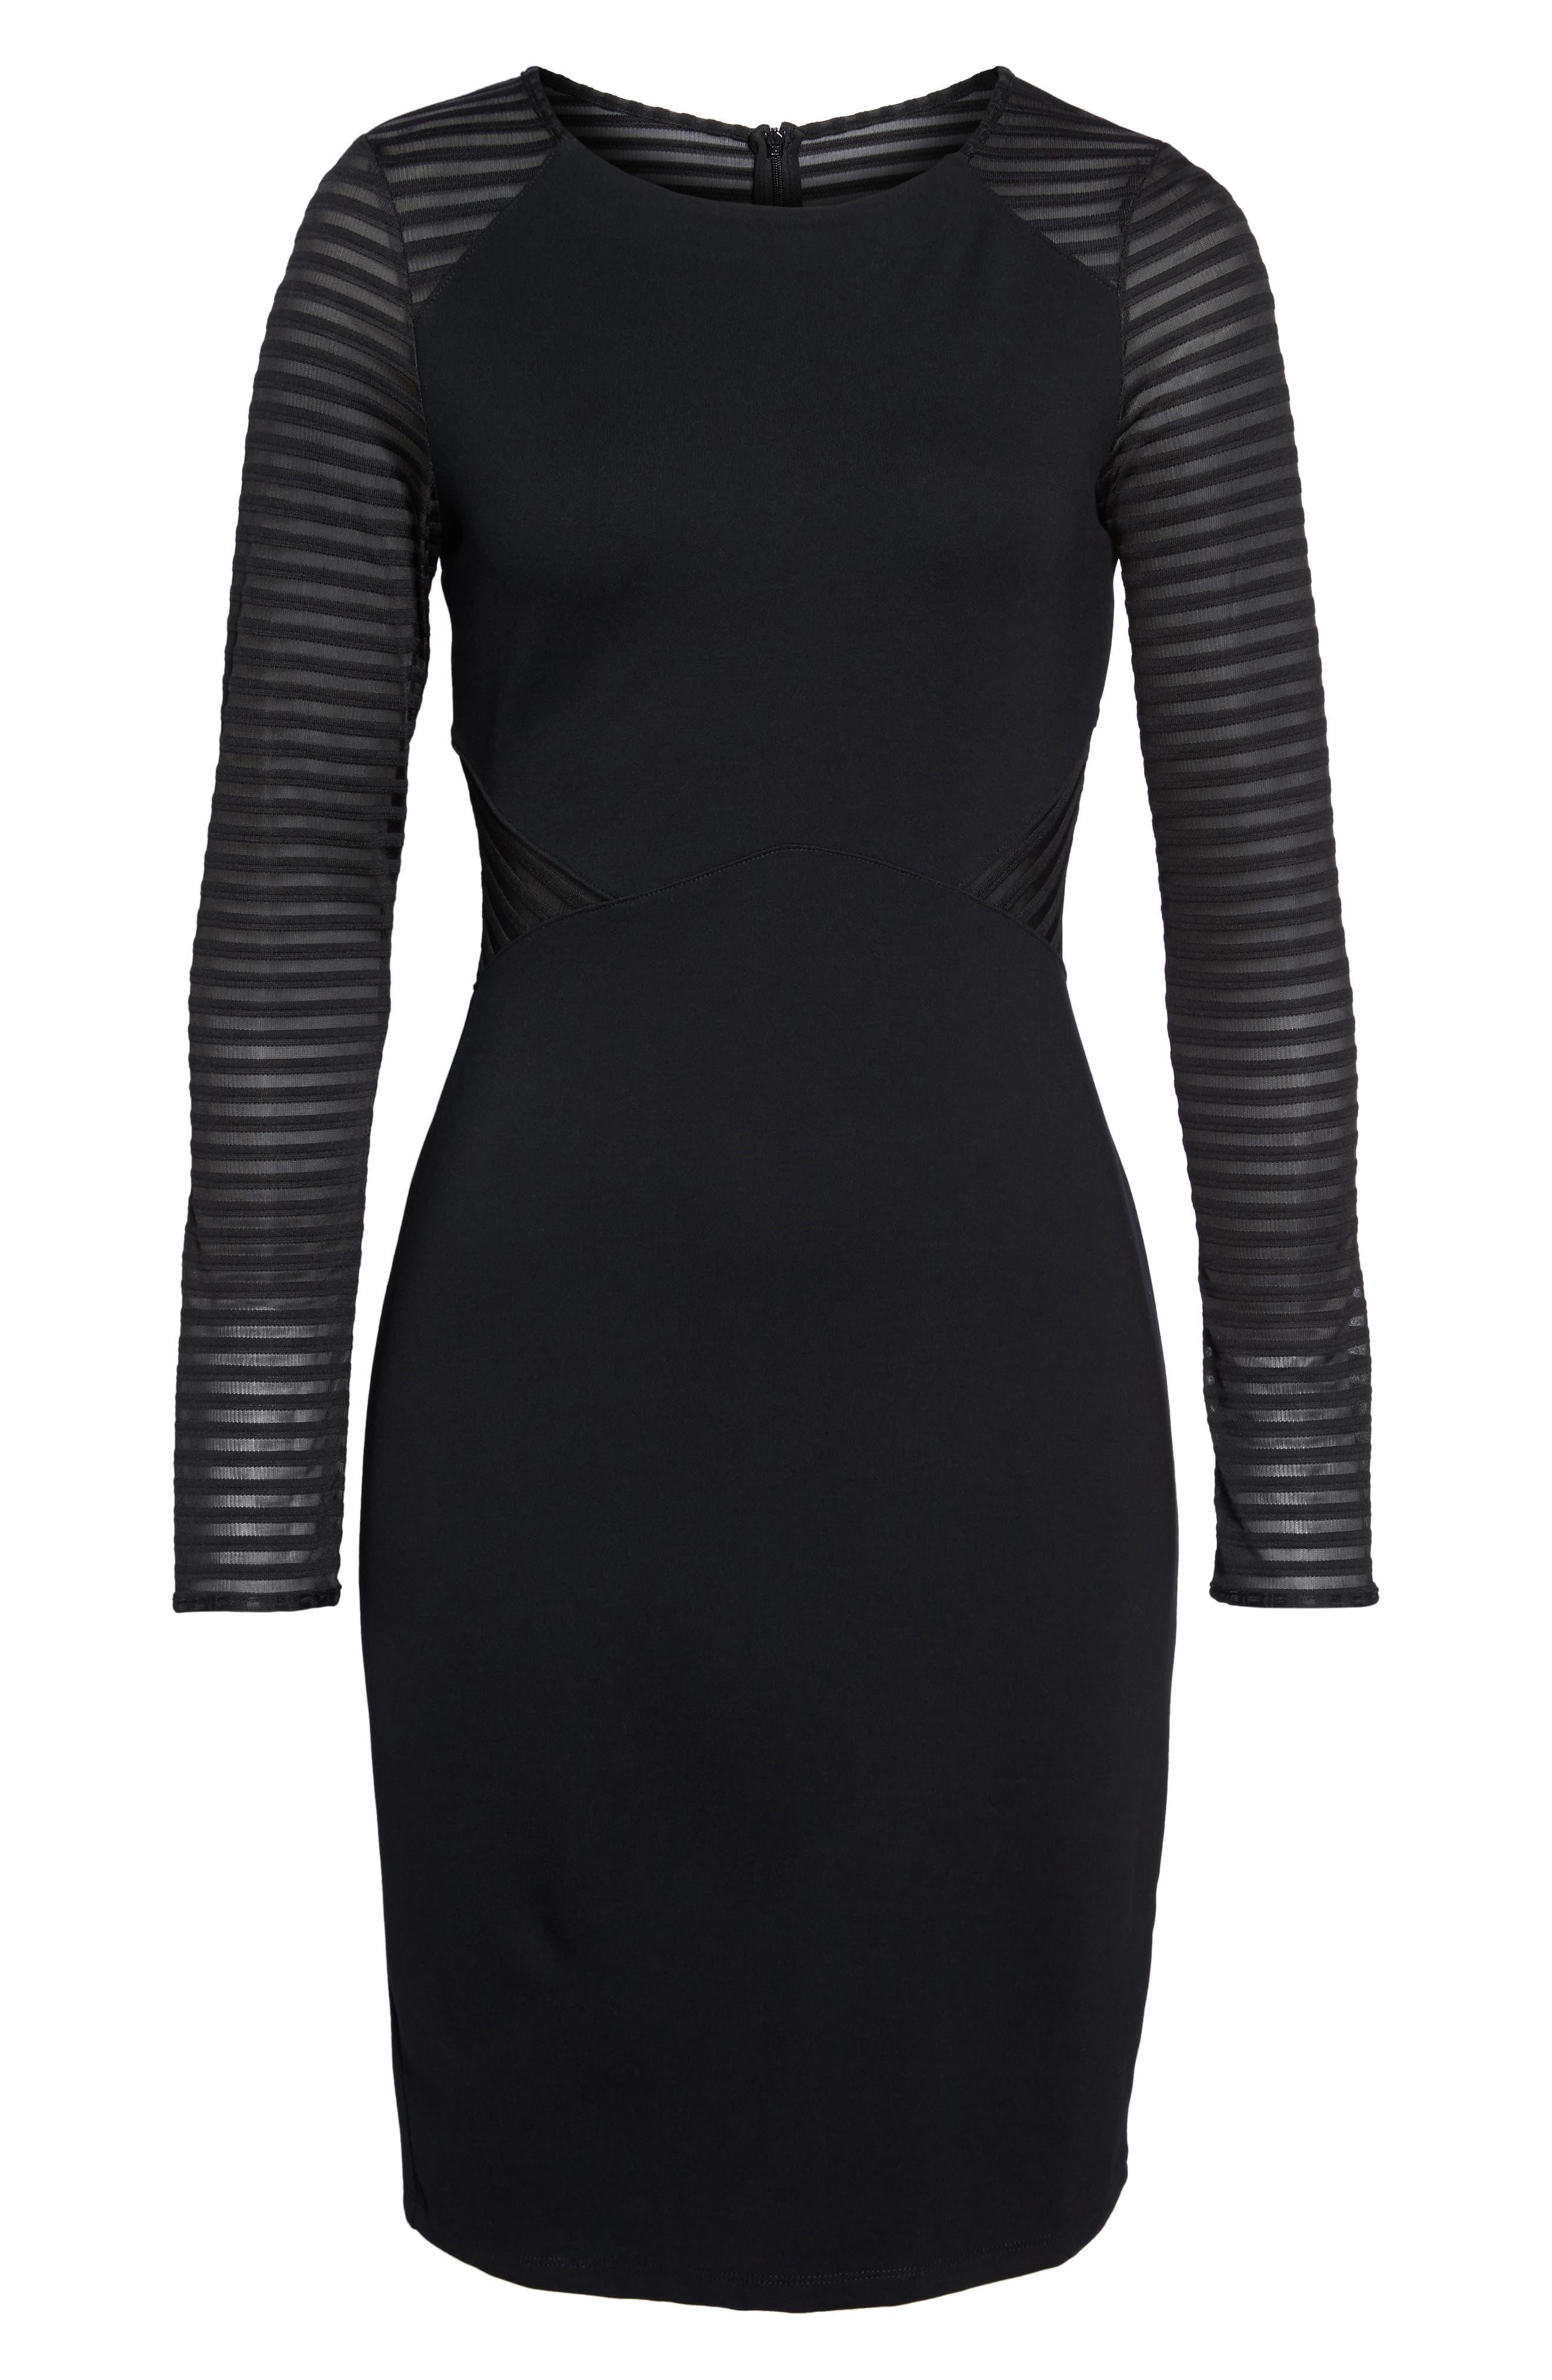 Thiestis Body-Con Dress,                             Alternate thumbnail 6, color,                             002